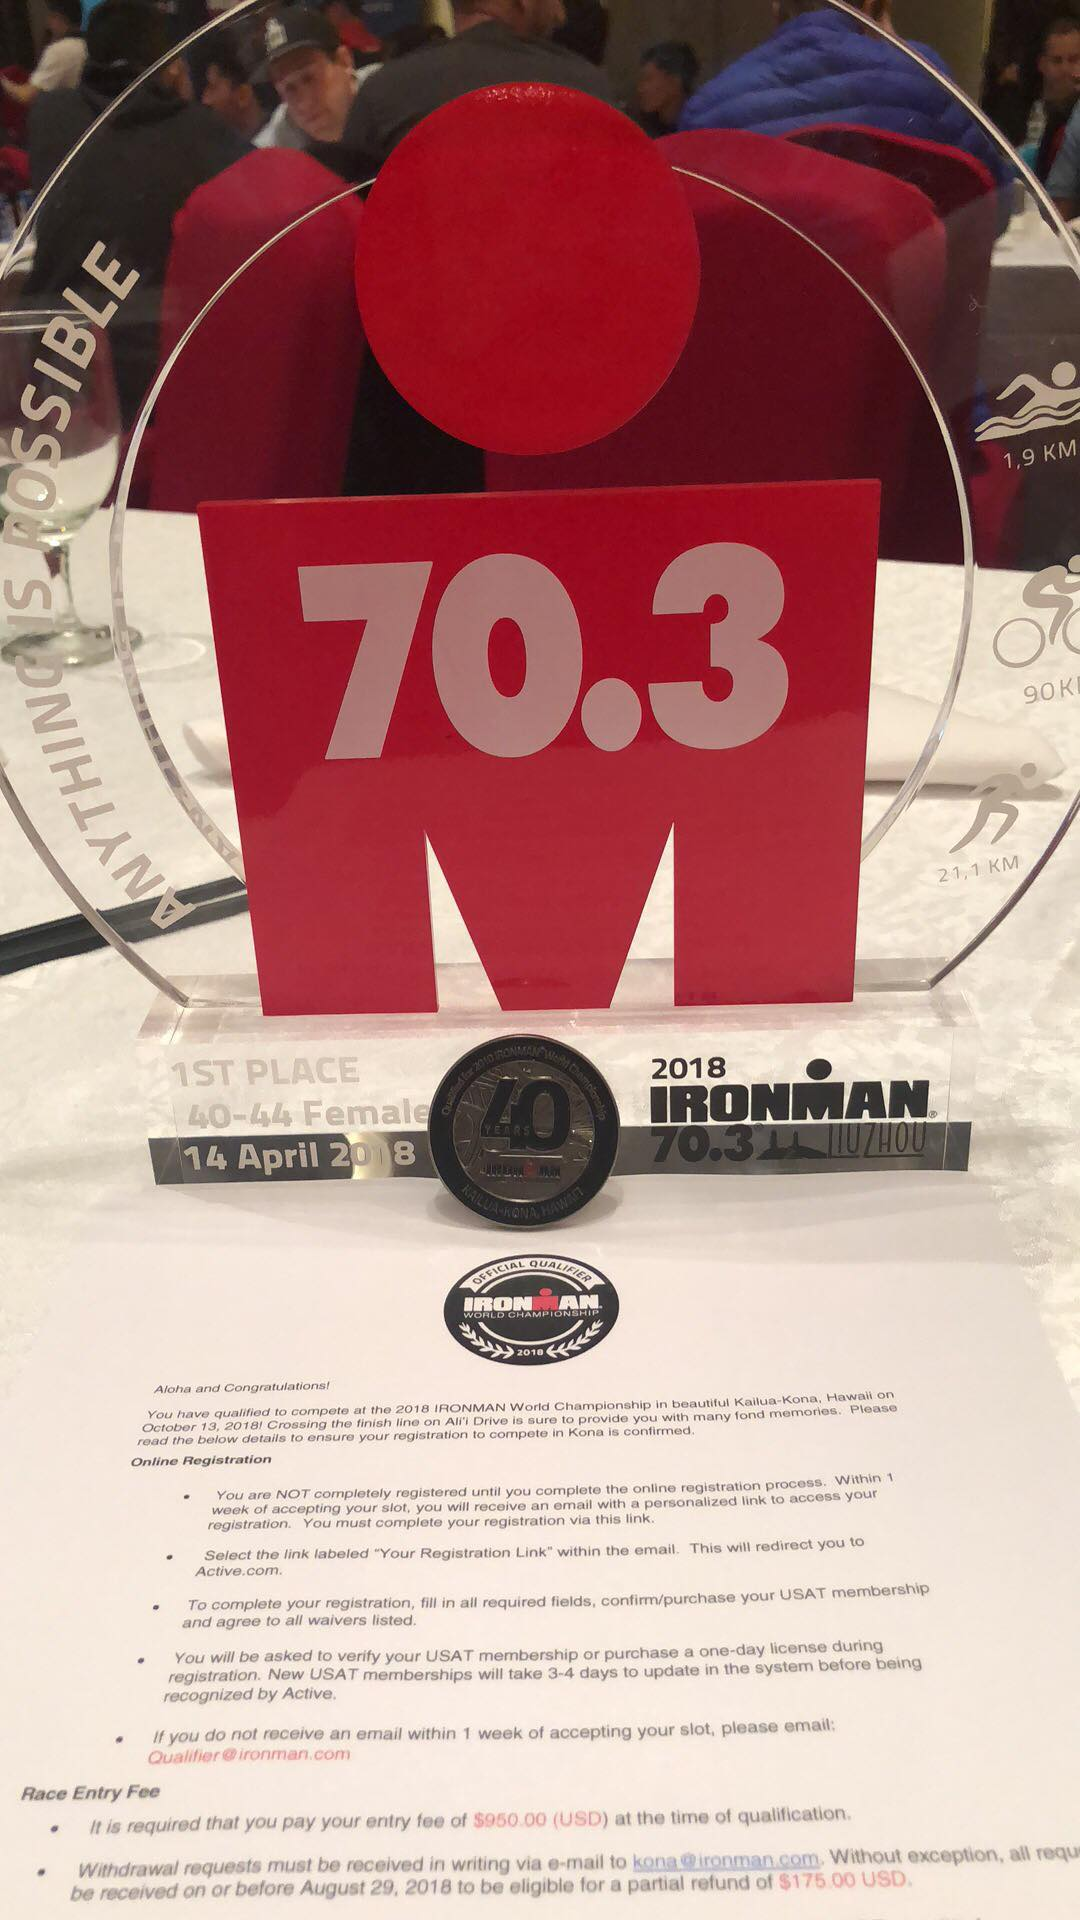 Coach_Terry_Wilson_Shannon_Florea_Rasco_Ironman_70.3_lihzou_Kona_Slot.jpg